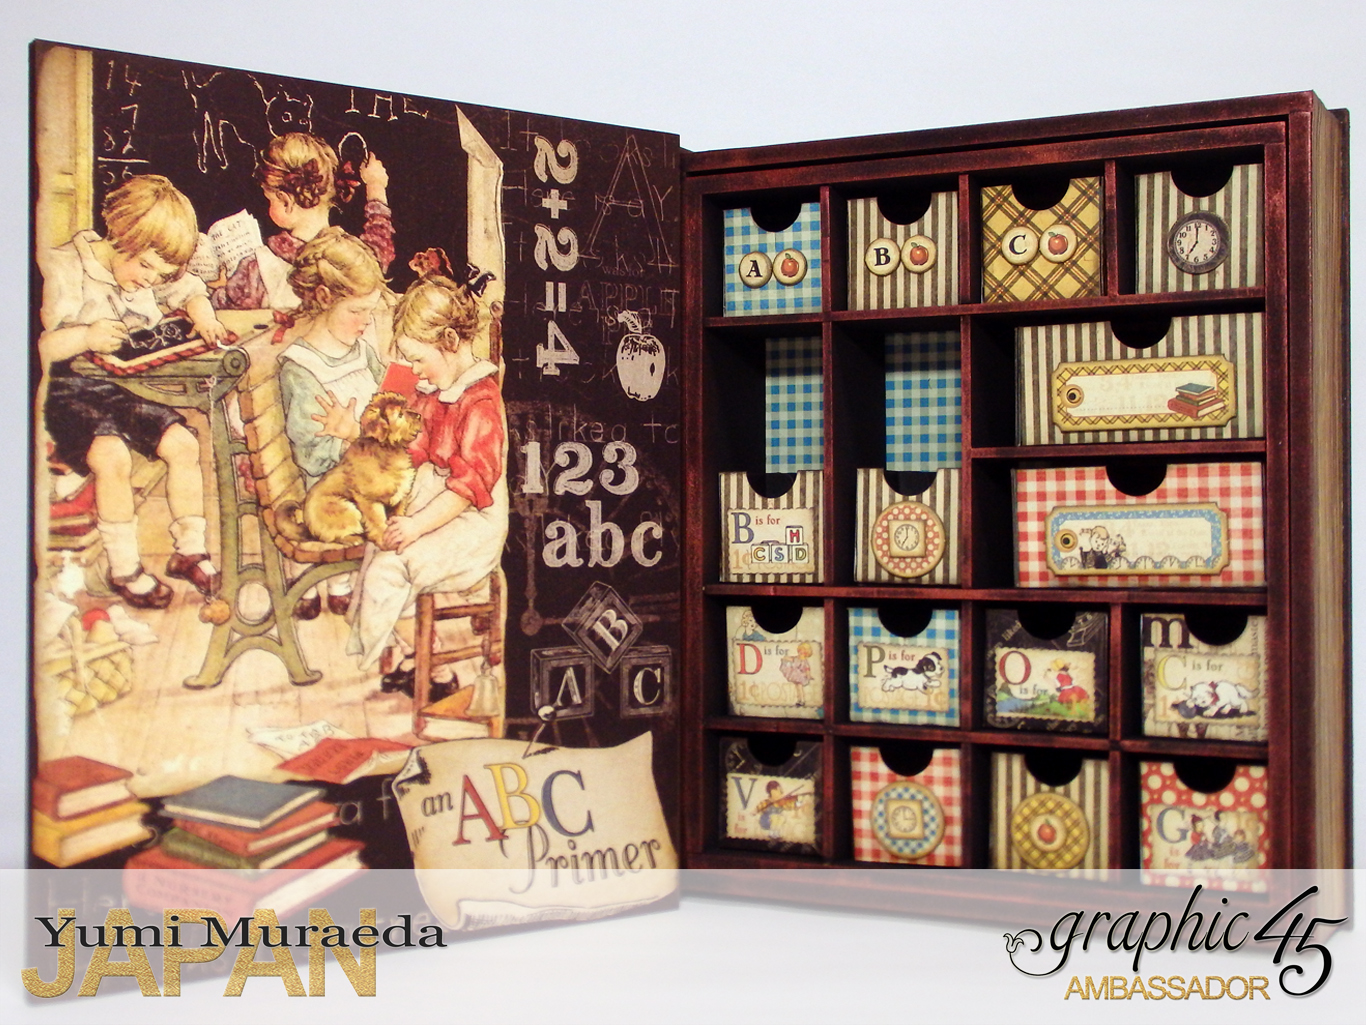 2My Memory Drawers, An Abc Primer, by Yumi Muraeda, Product by Graphic 45jpg